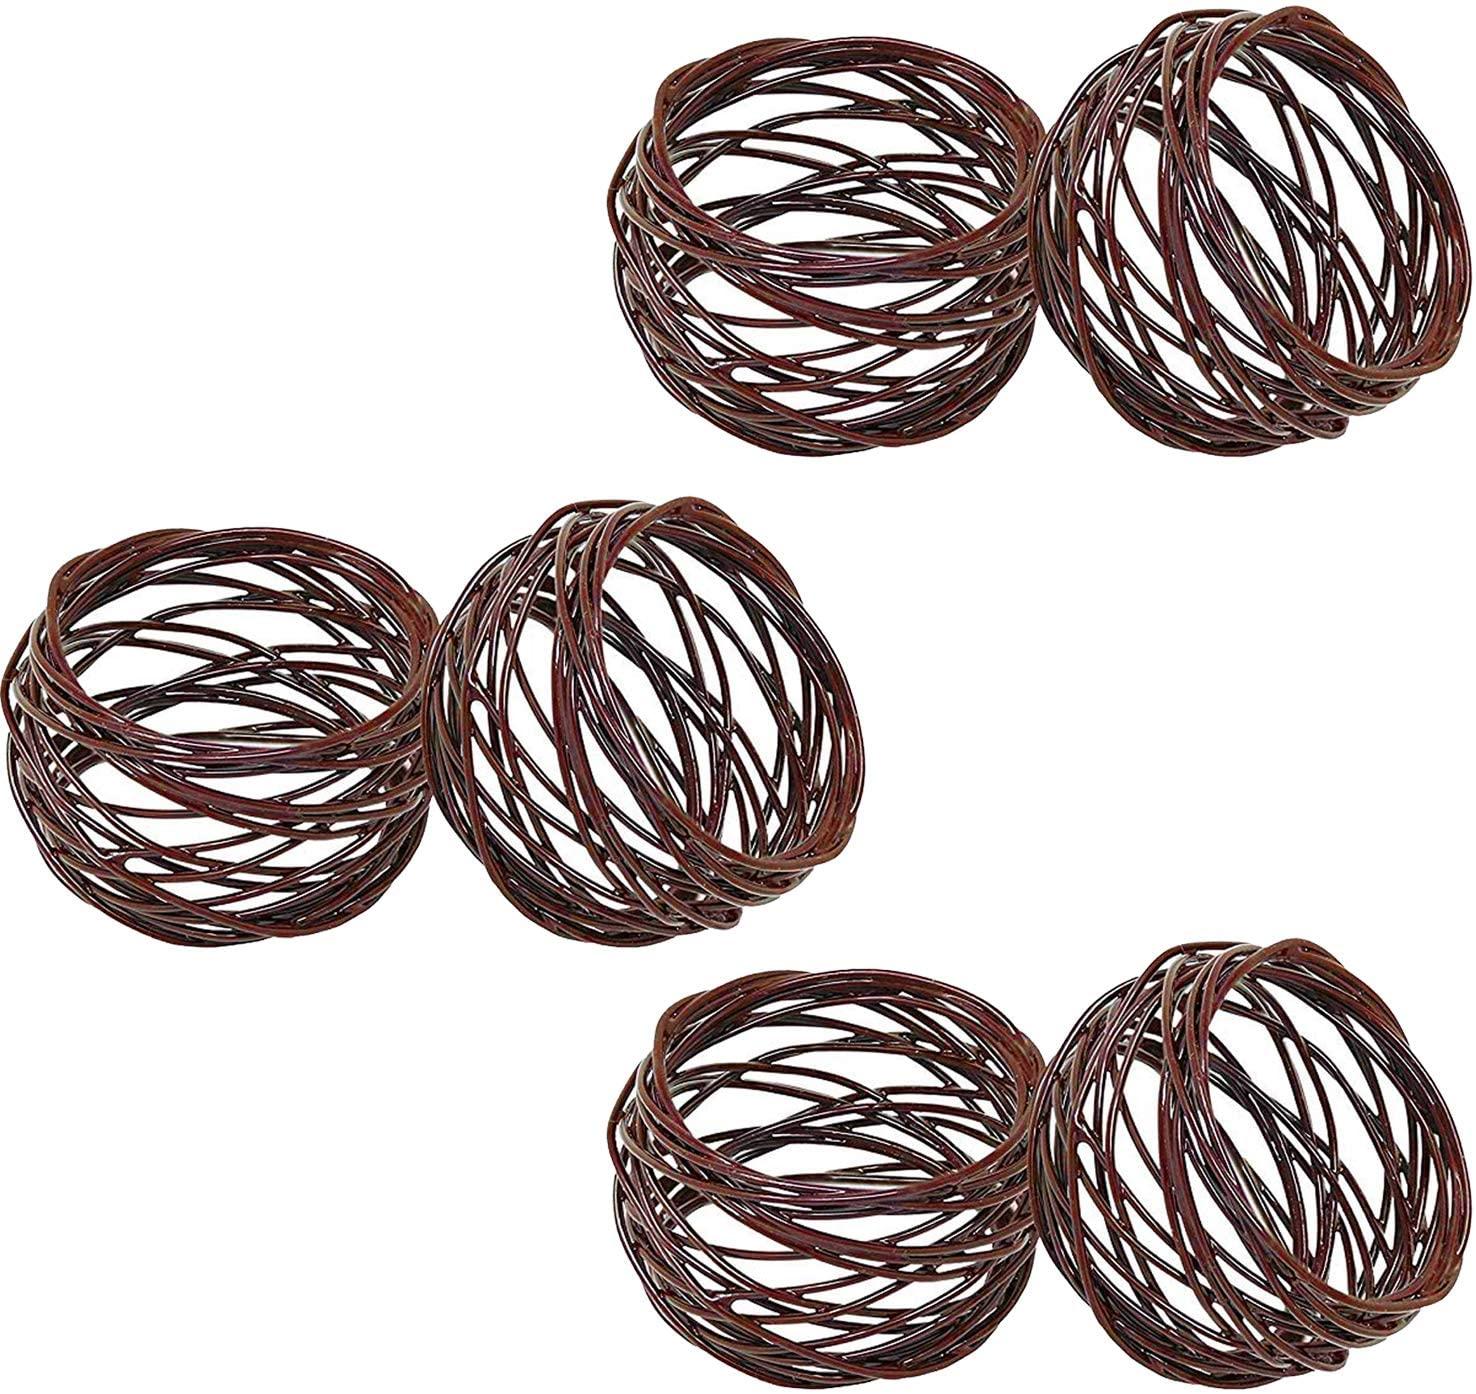 SKAVIJ Handmade Round Metal Mesh Napkin Rings Holder for Dinning Table Parties Everyday, Set of 6 (Brown)